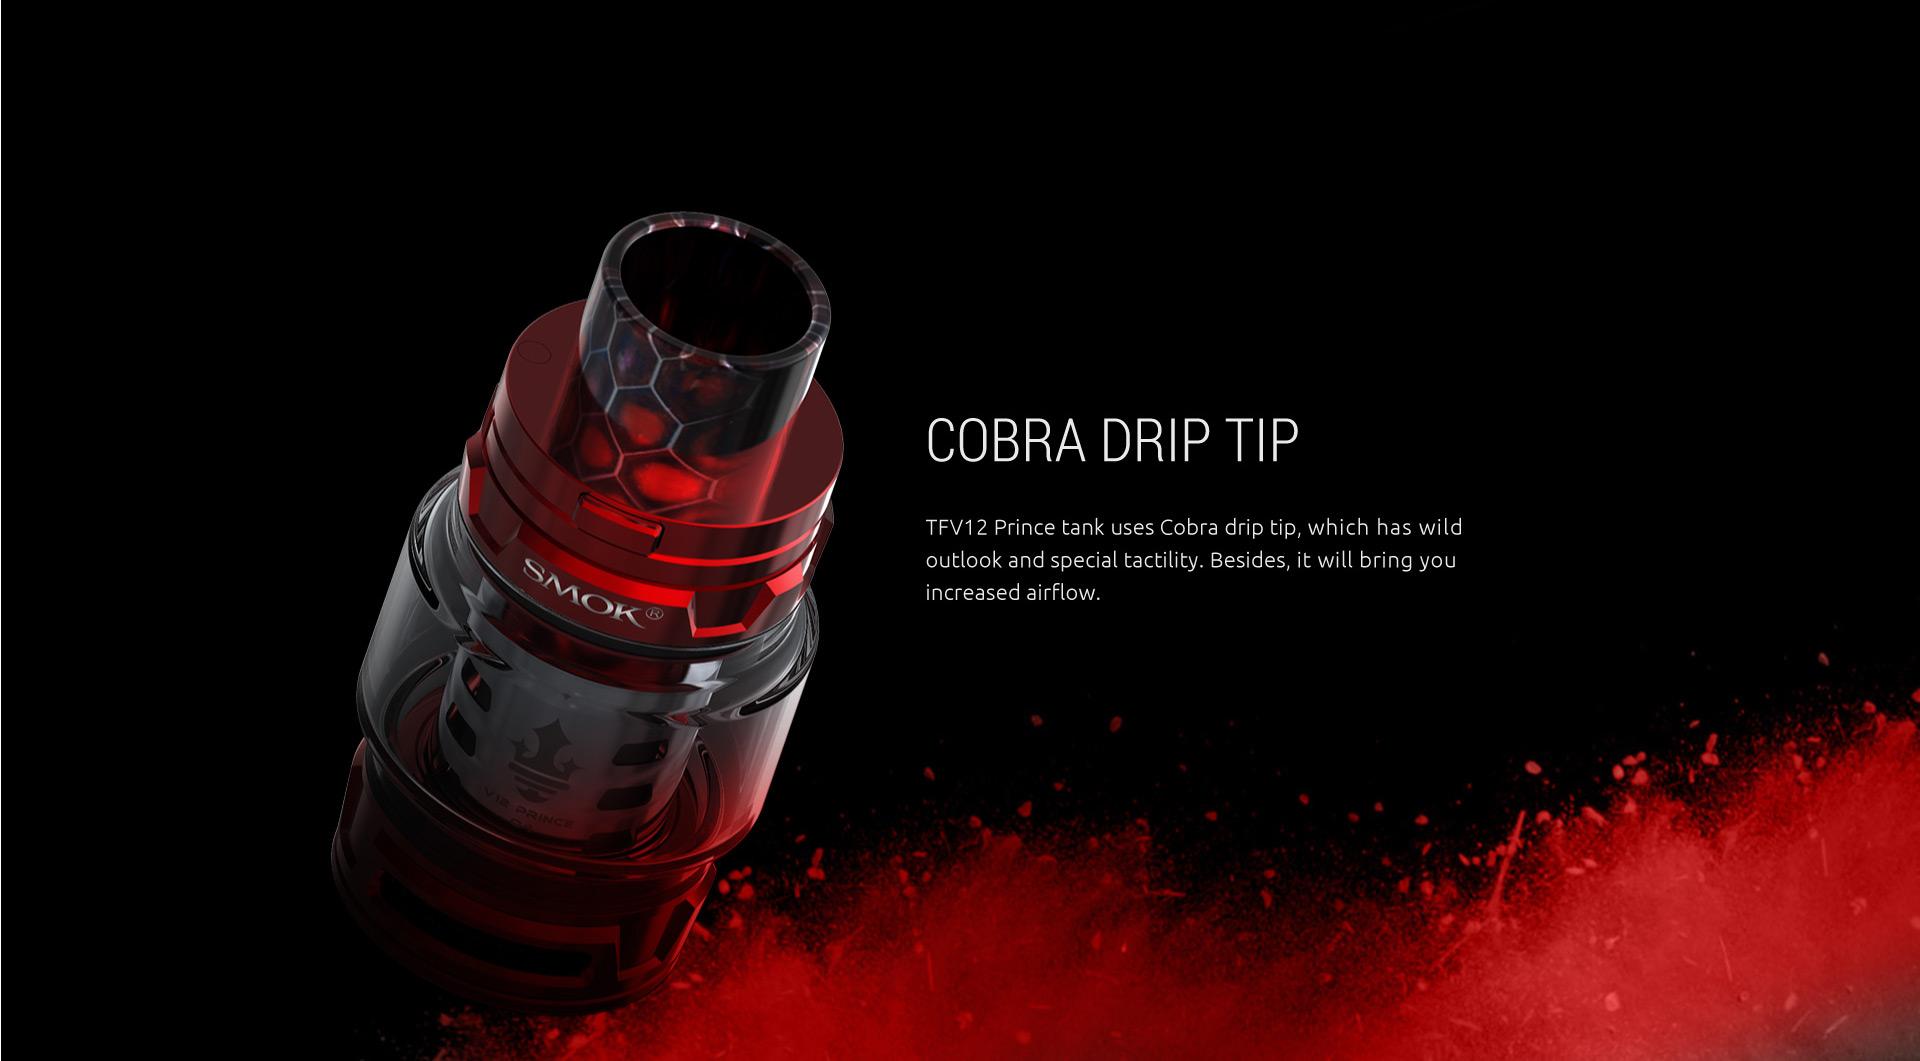 Cobra Drip Tip